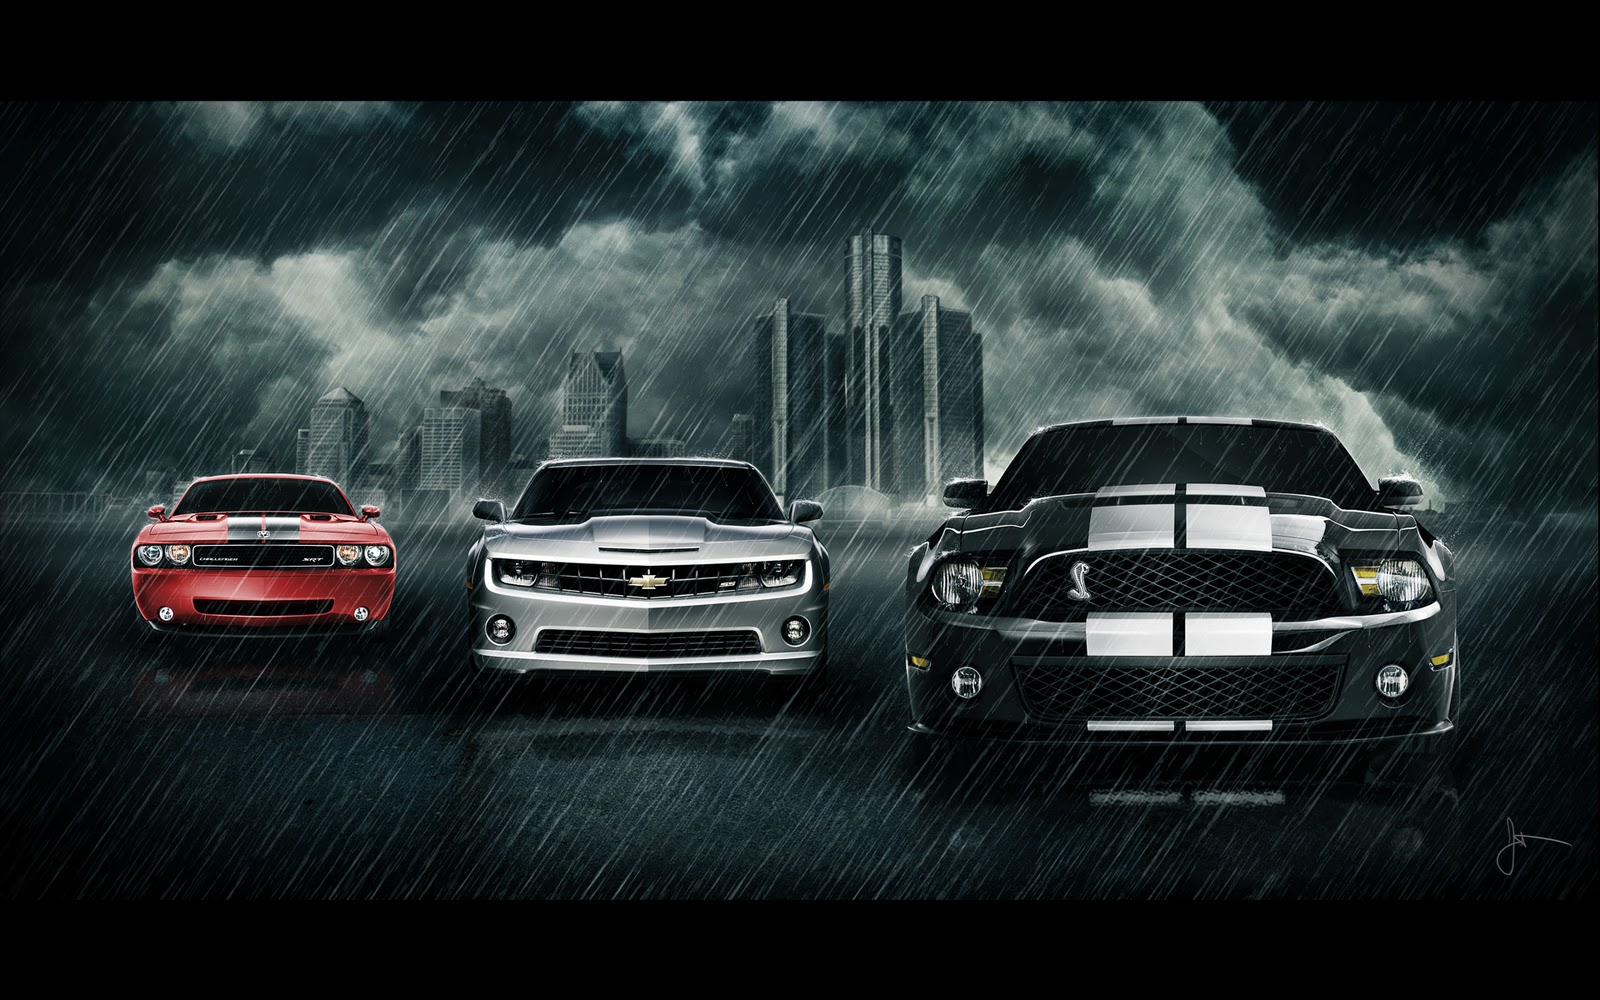 Hd Car wallpapers muscle car wallpapers for desktop 1600x1000